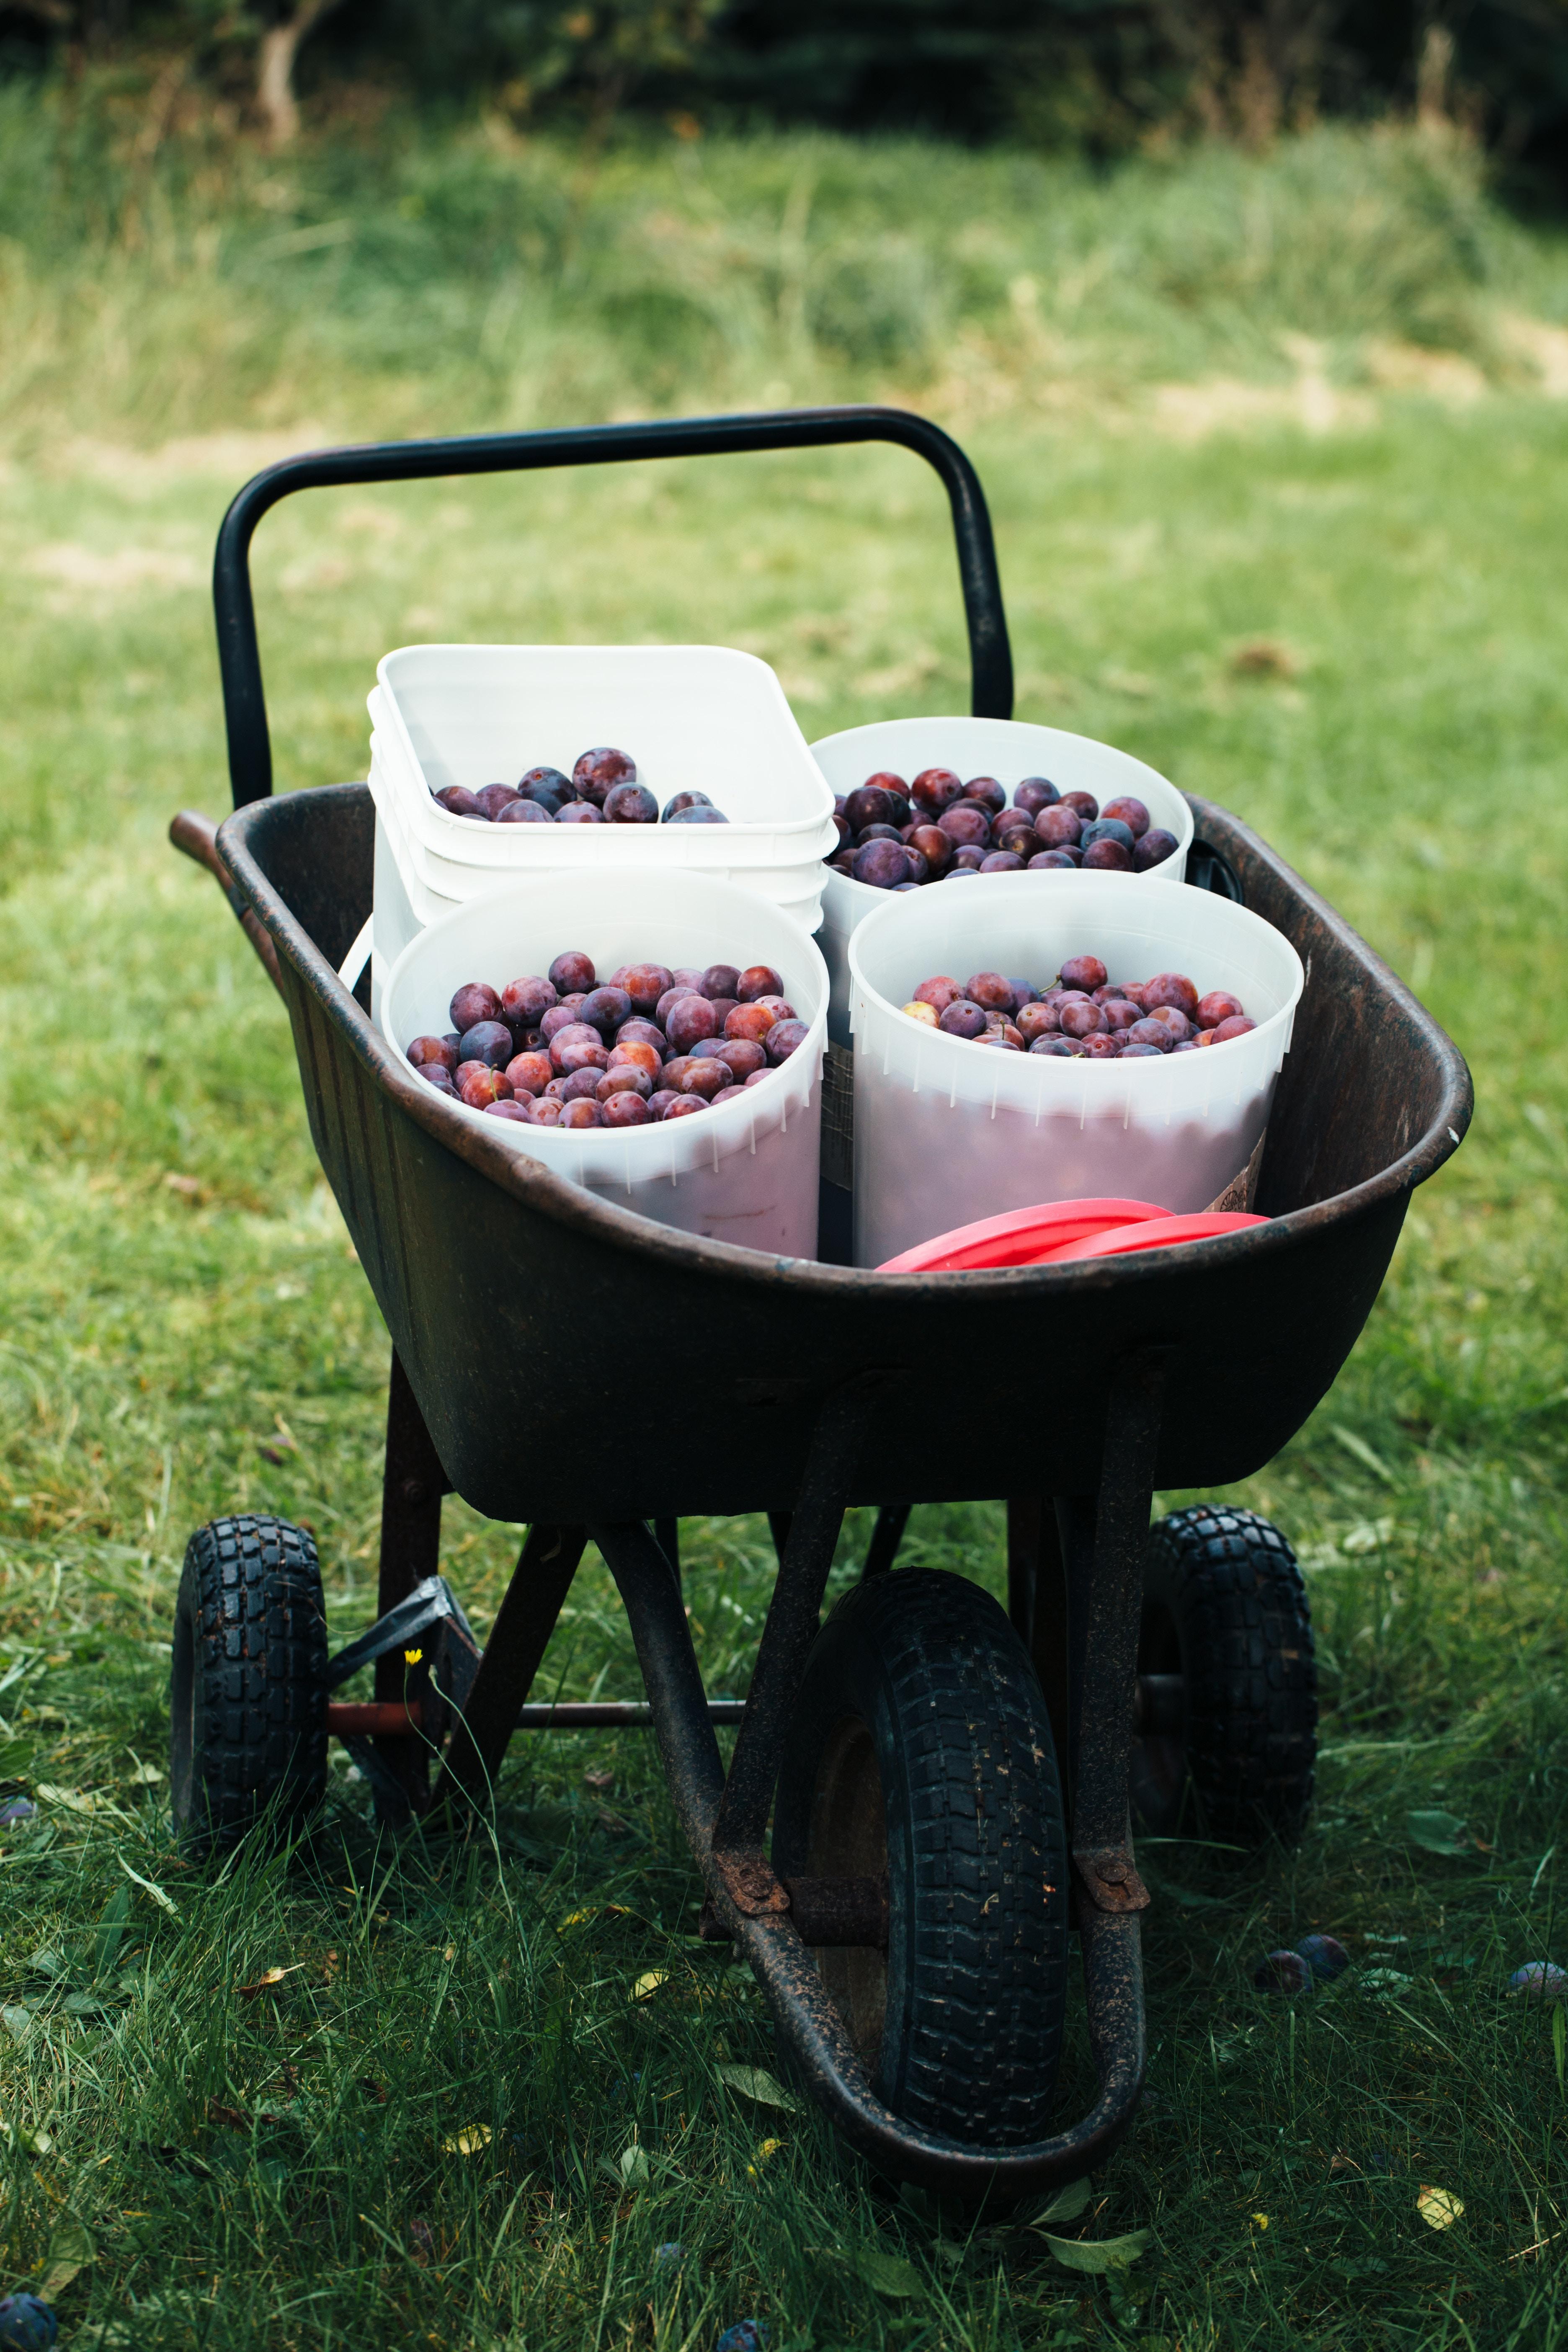 Fruits in Wheelbarrow